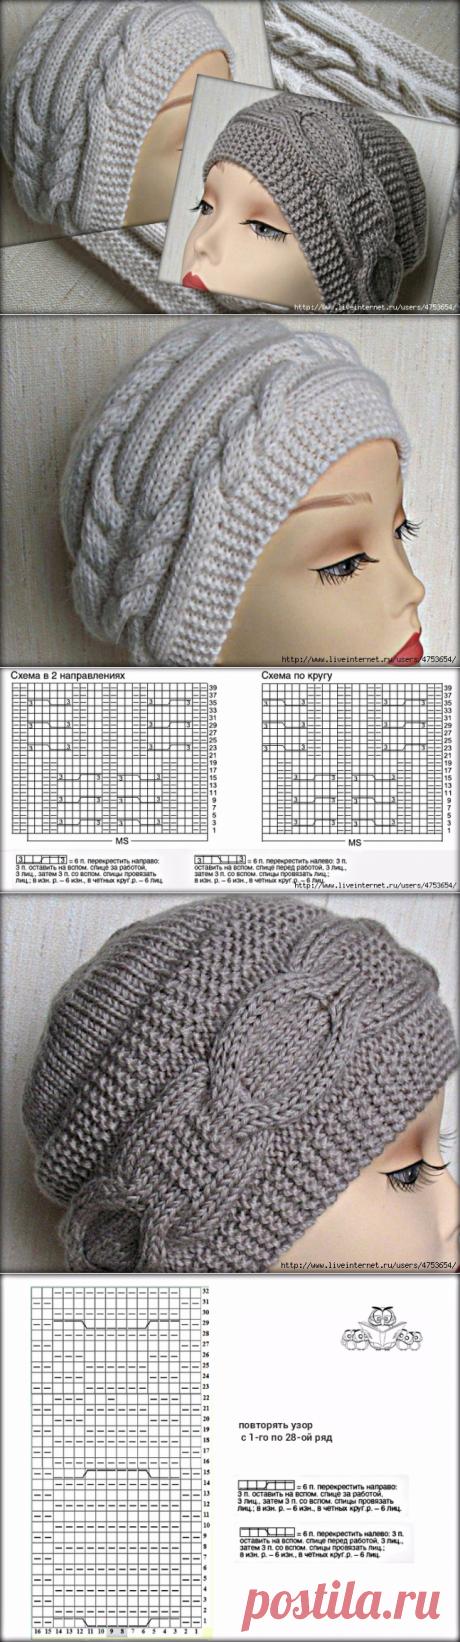 Hats from Rian (riana-design)